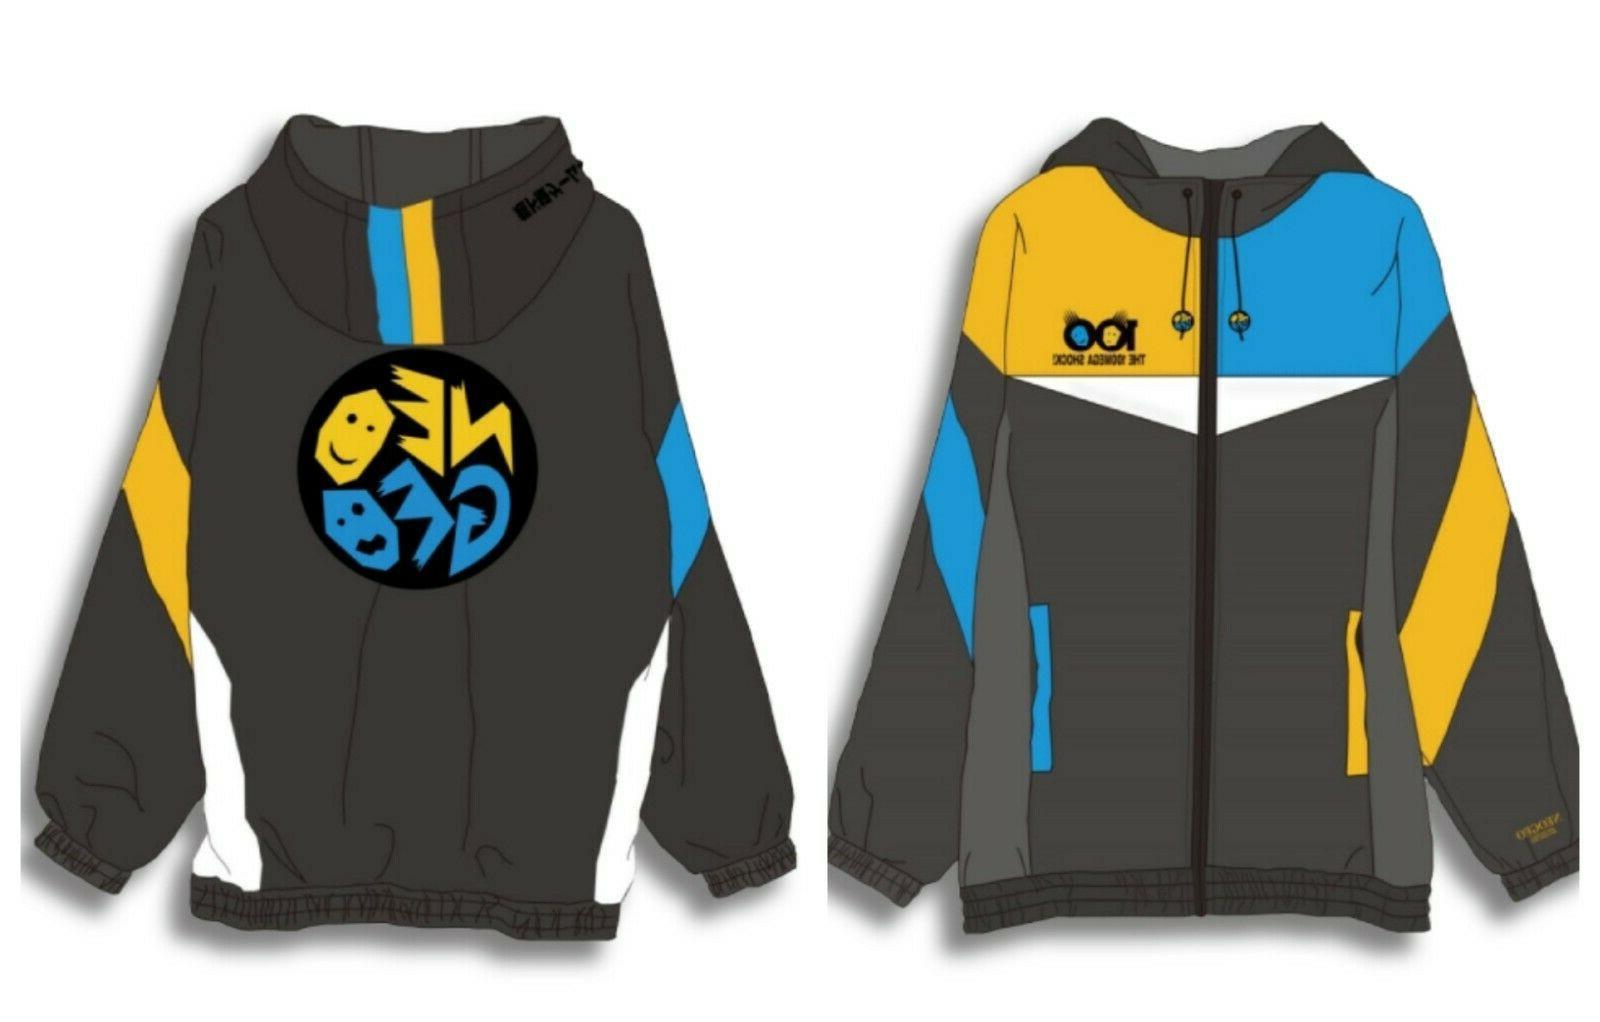 neo geo official windbreaker jacket game logo